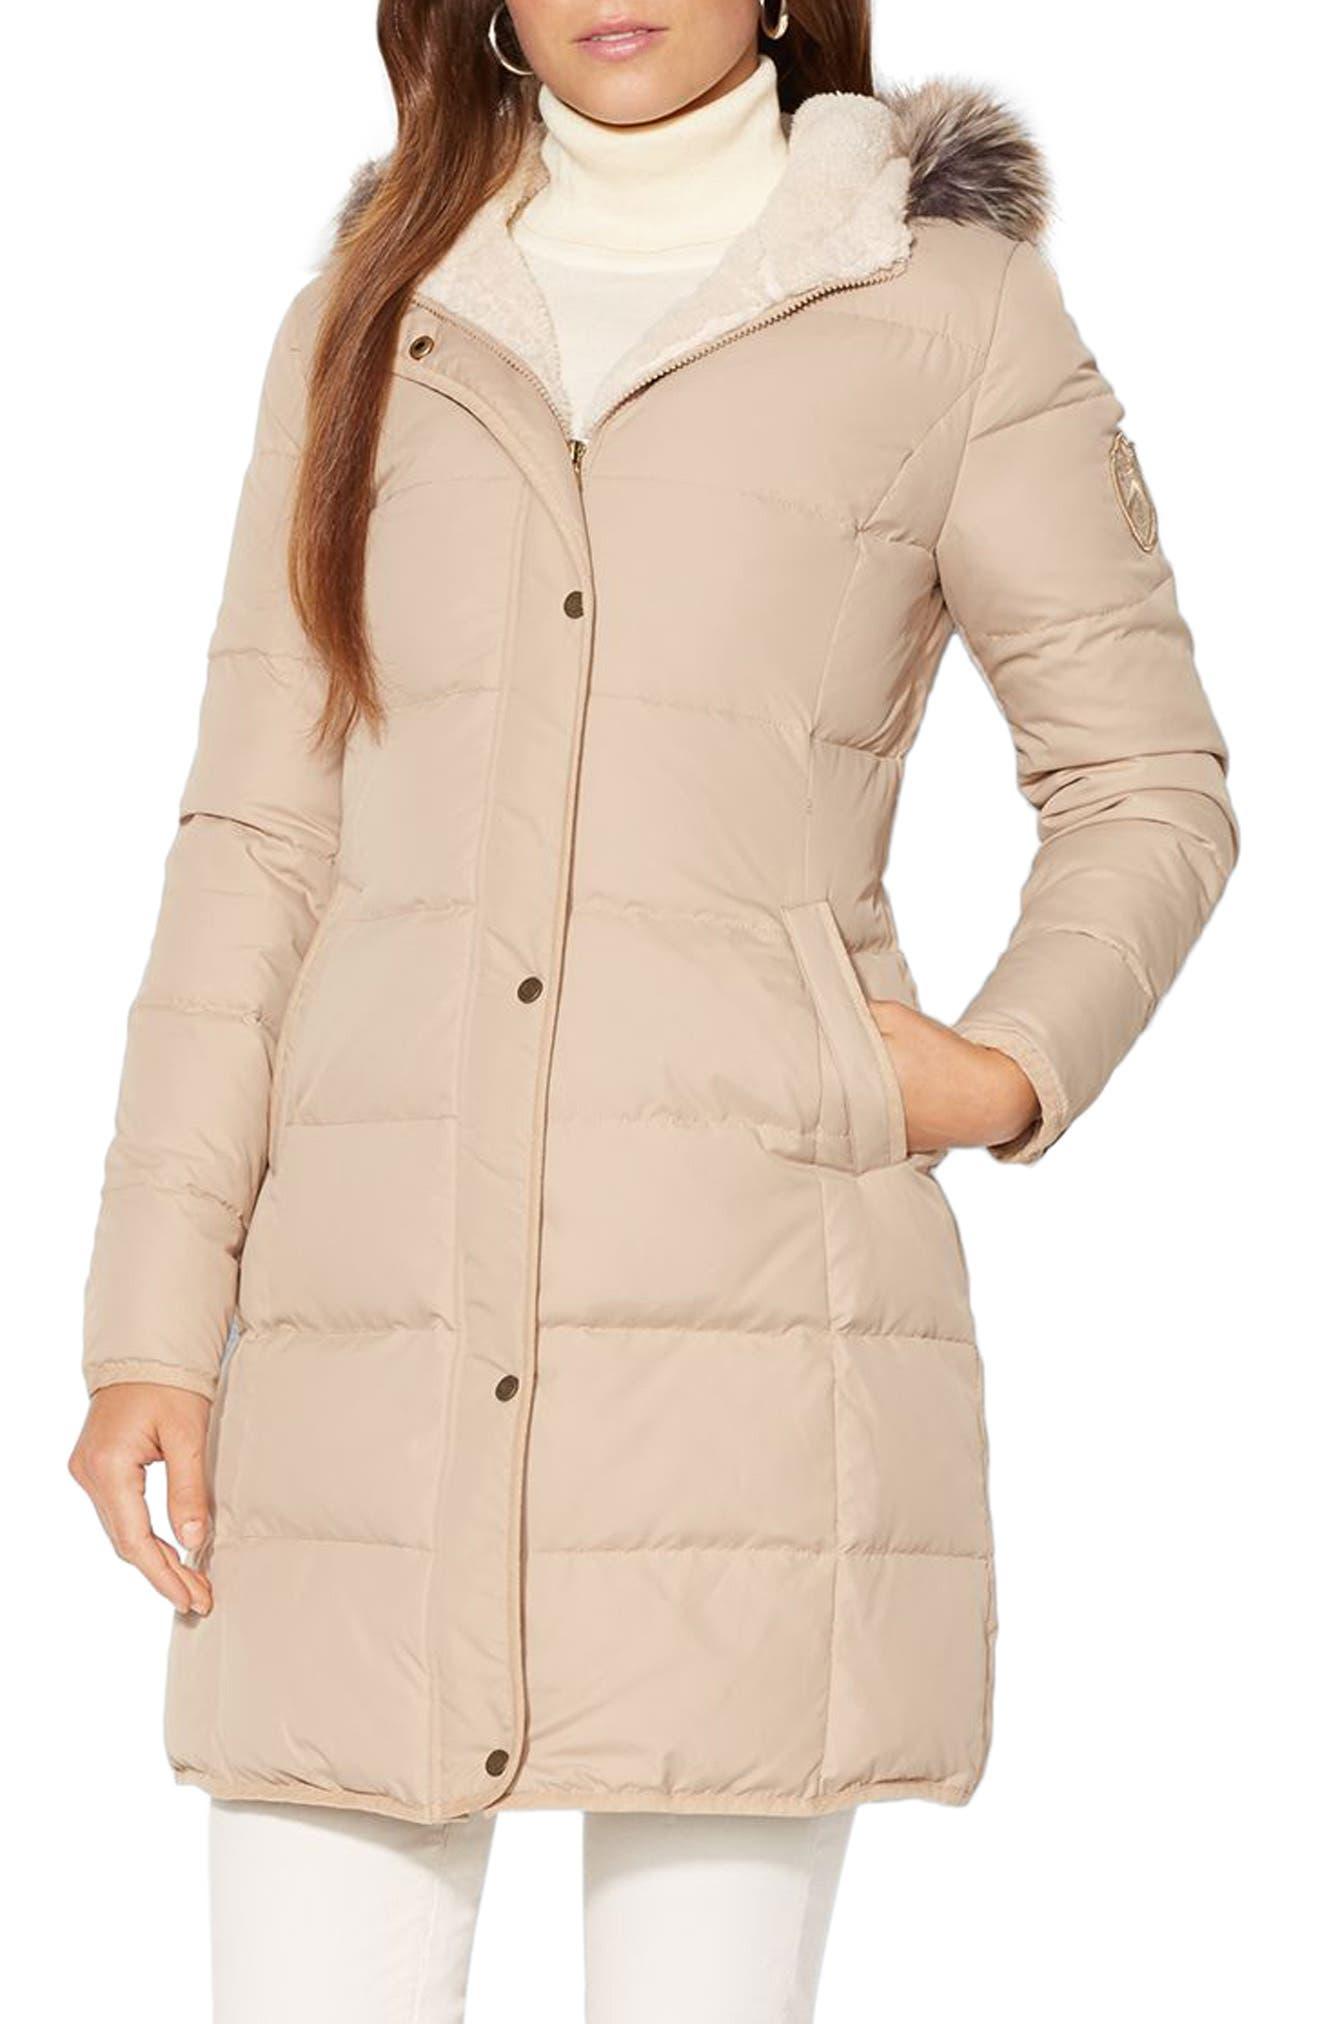 Main Image - Lauren Ralph Lauren Quilted Down & Feather Jacket with Faux Fur Trim (Petite)